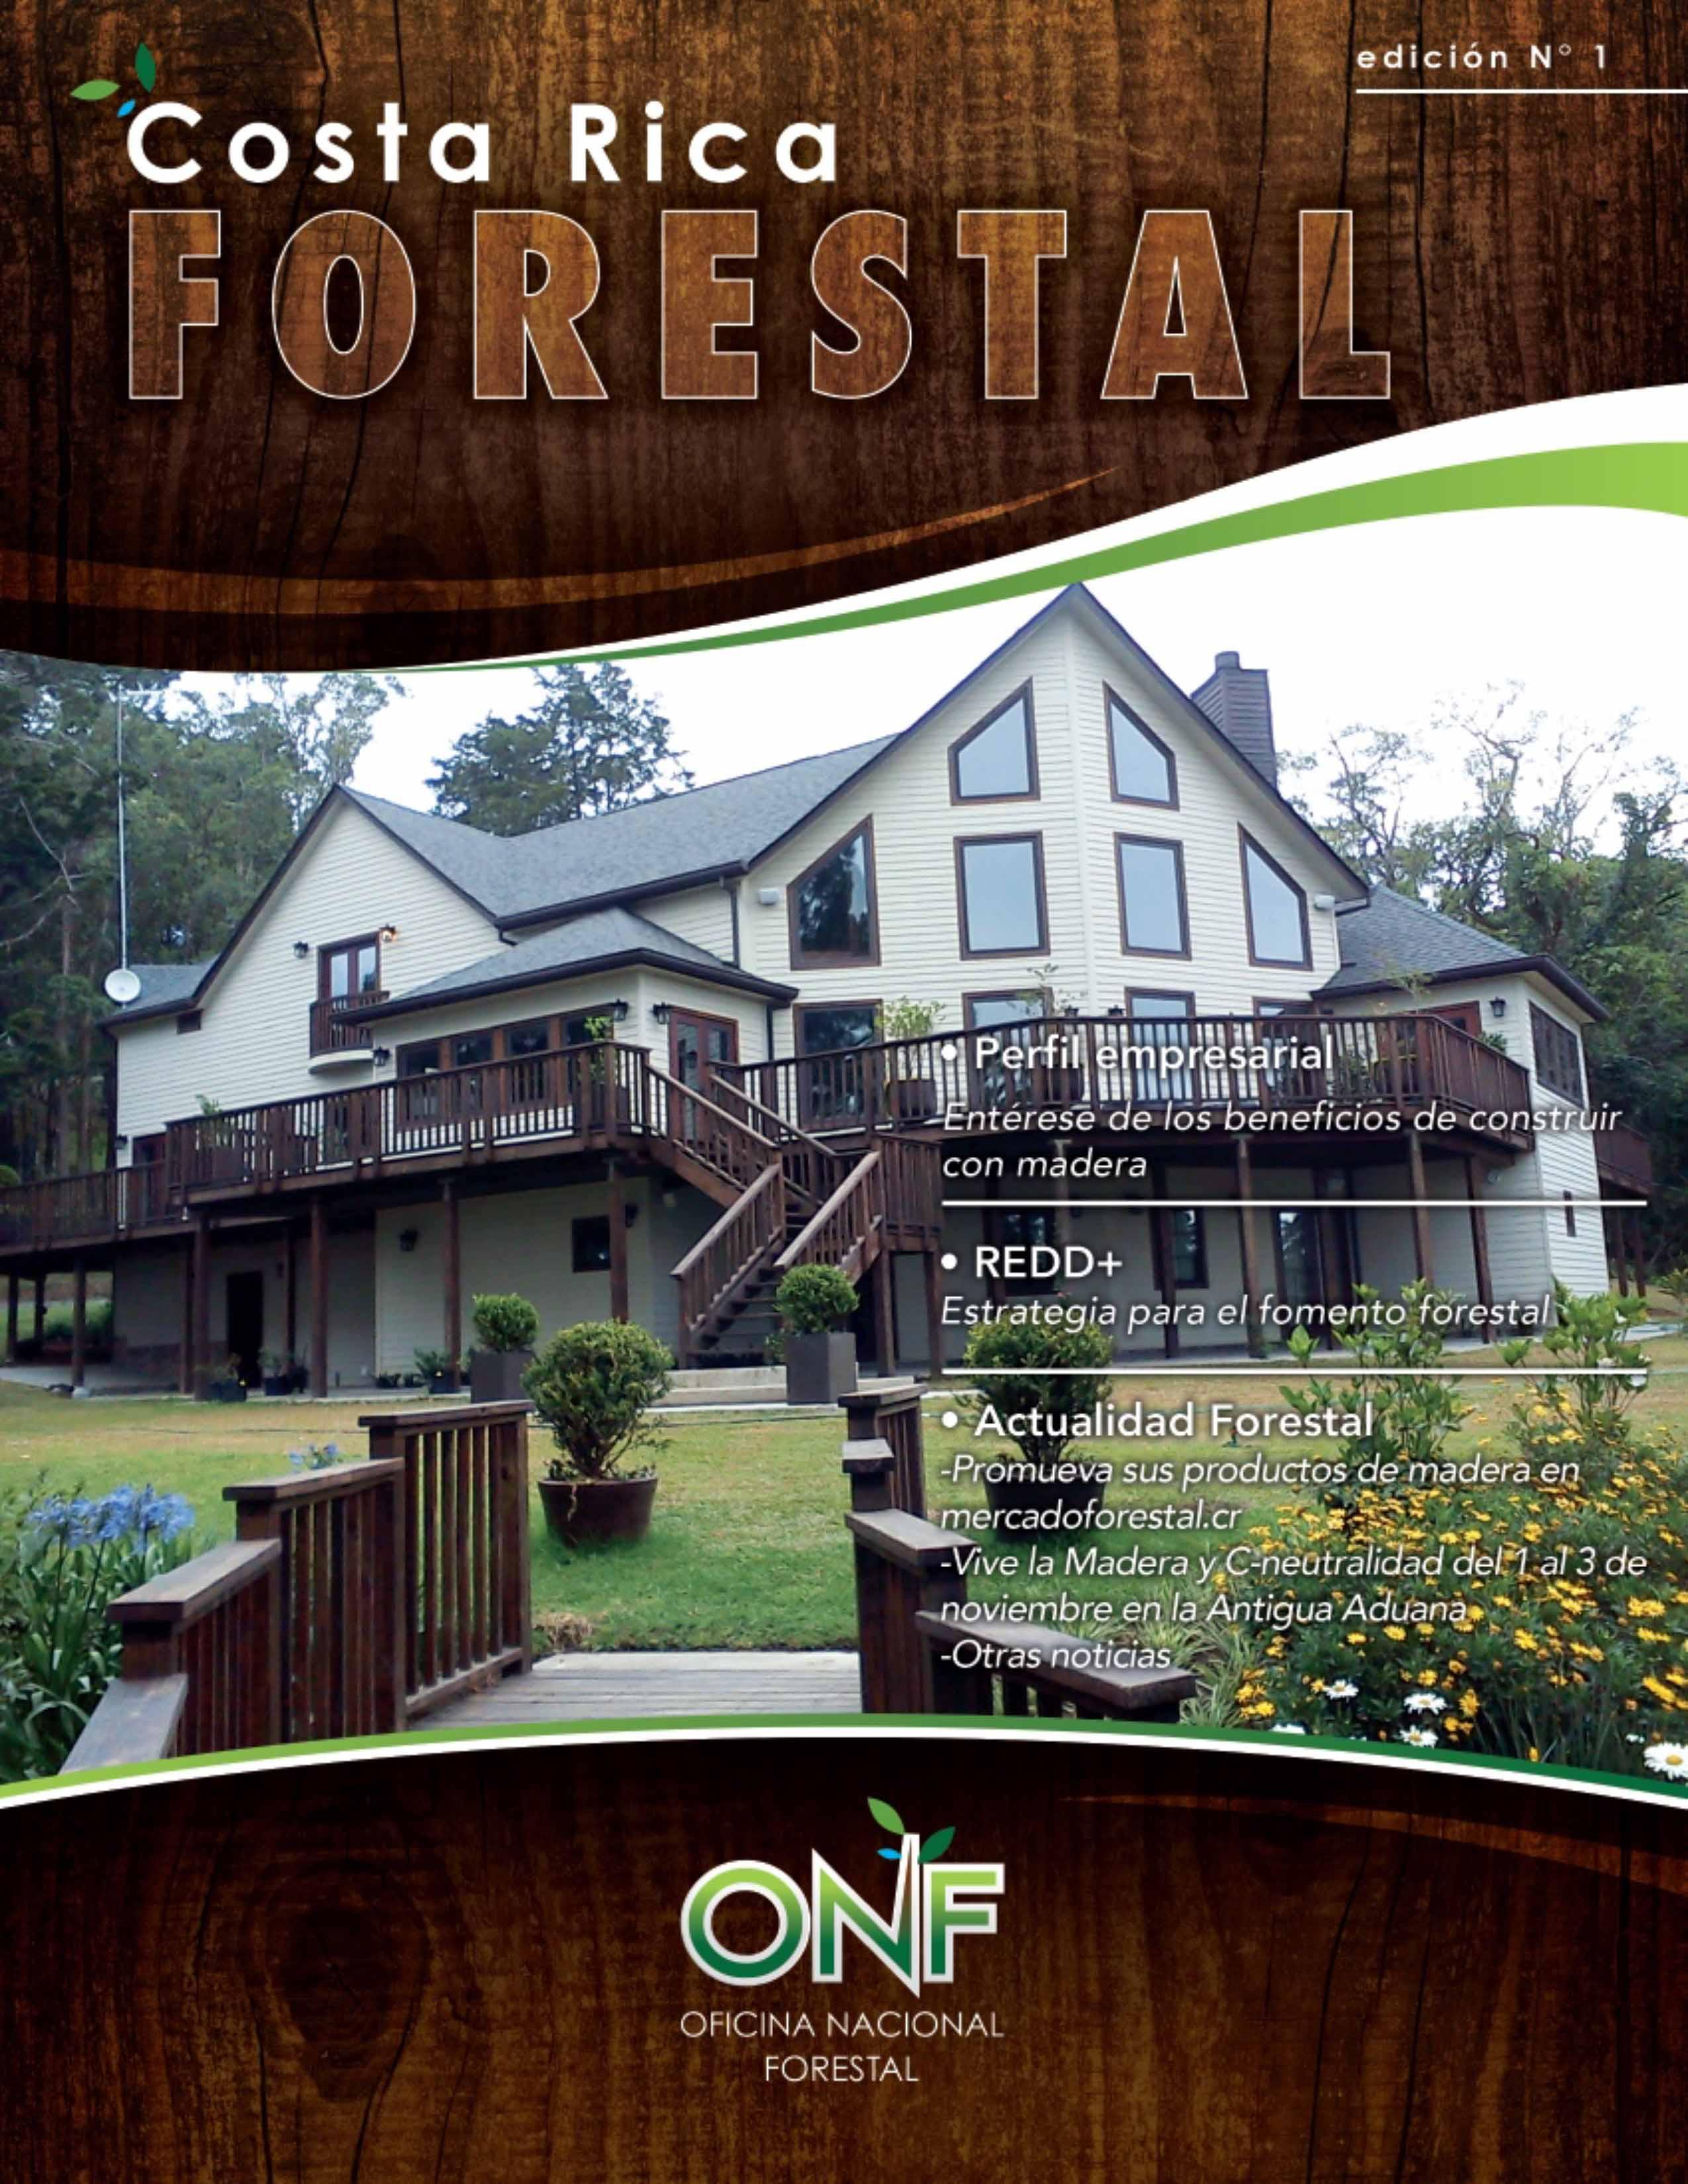 Revista Costa Rica Forestal n° 1